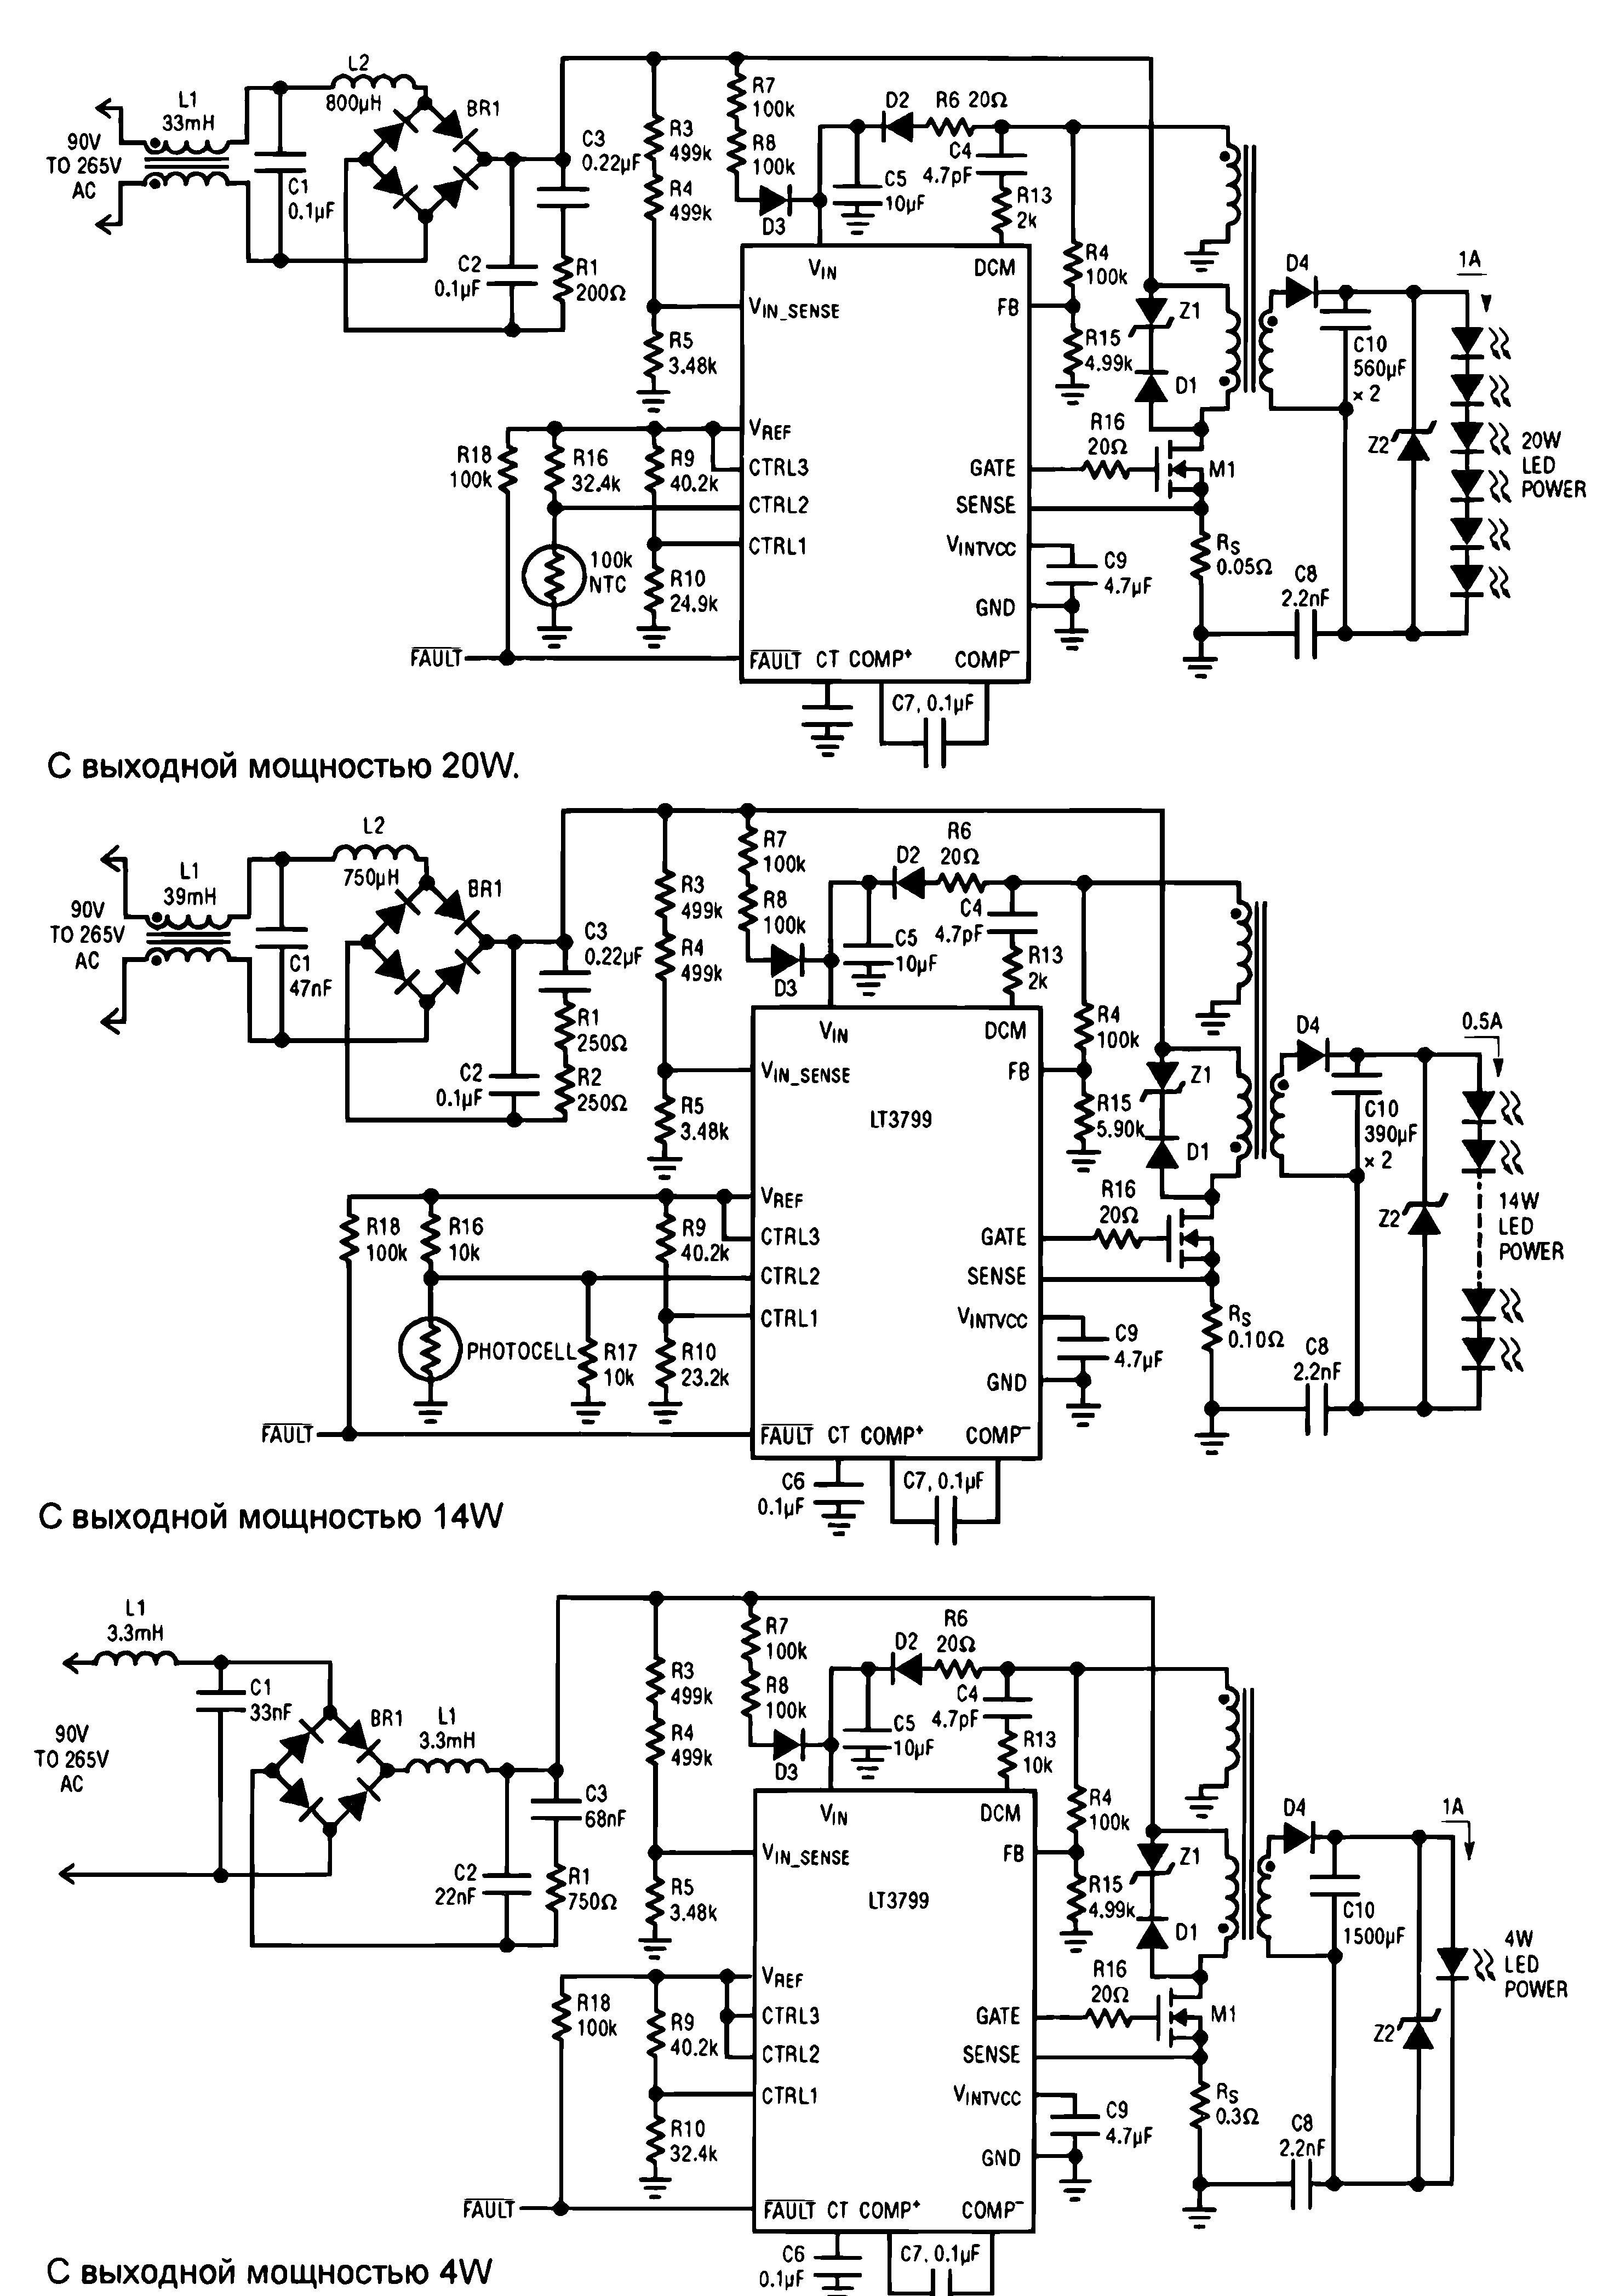 b для светодиодных /b ламп - b Блоки питания /b.